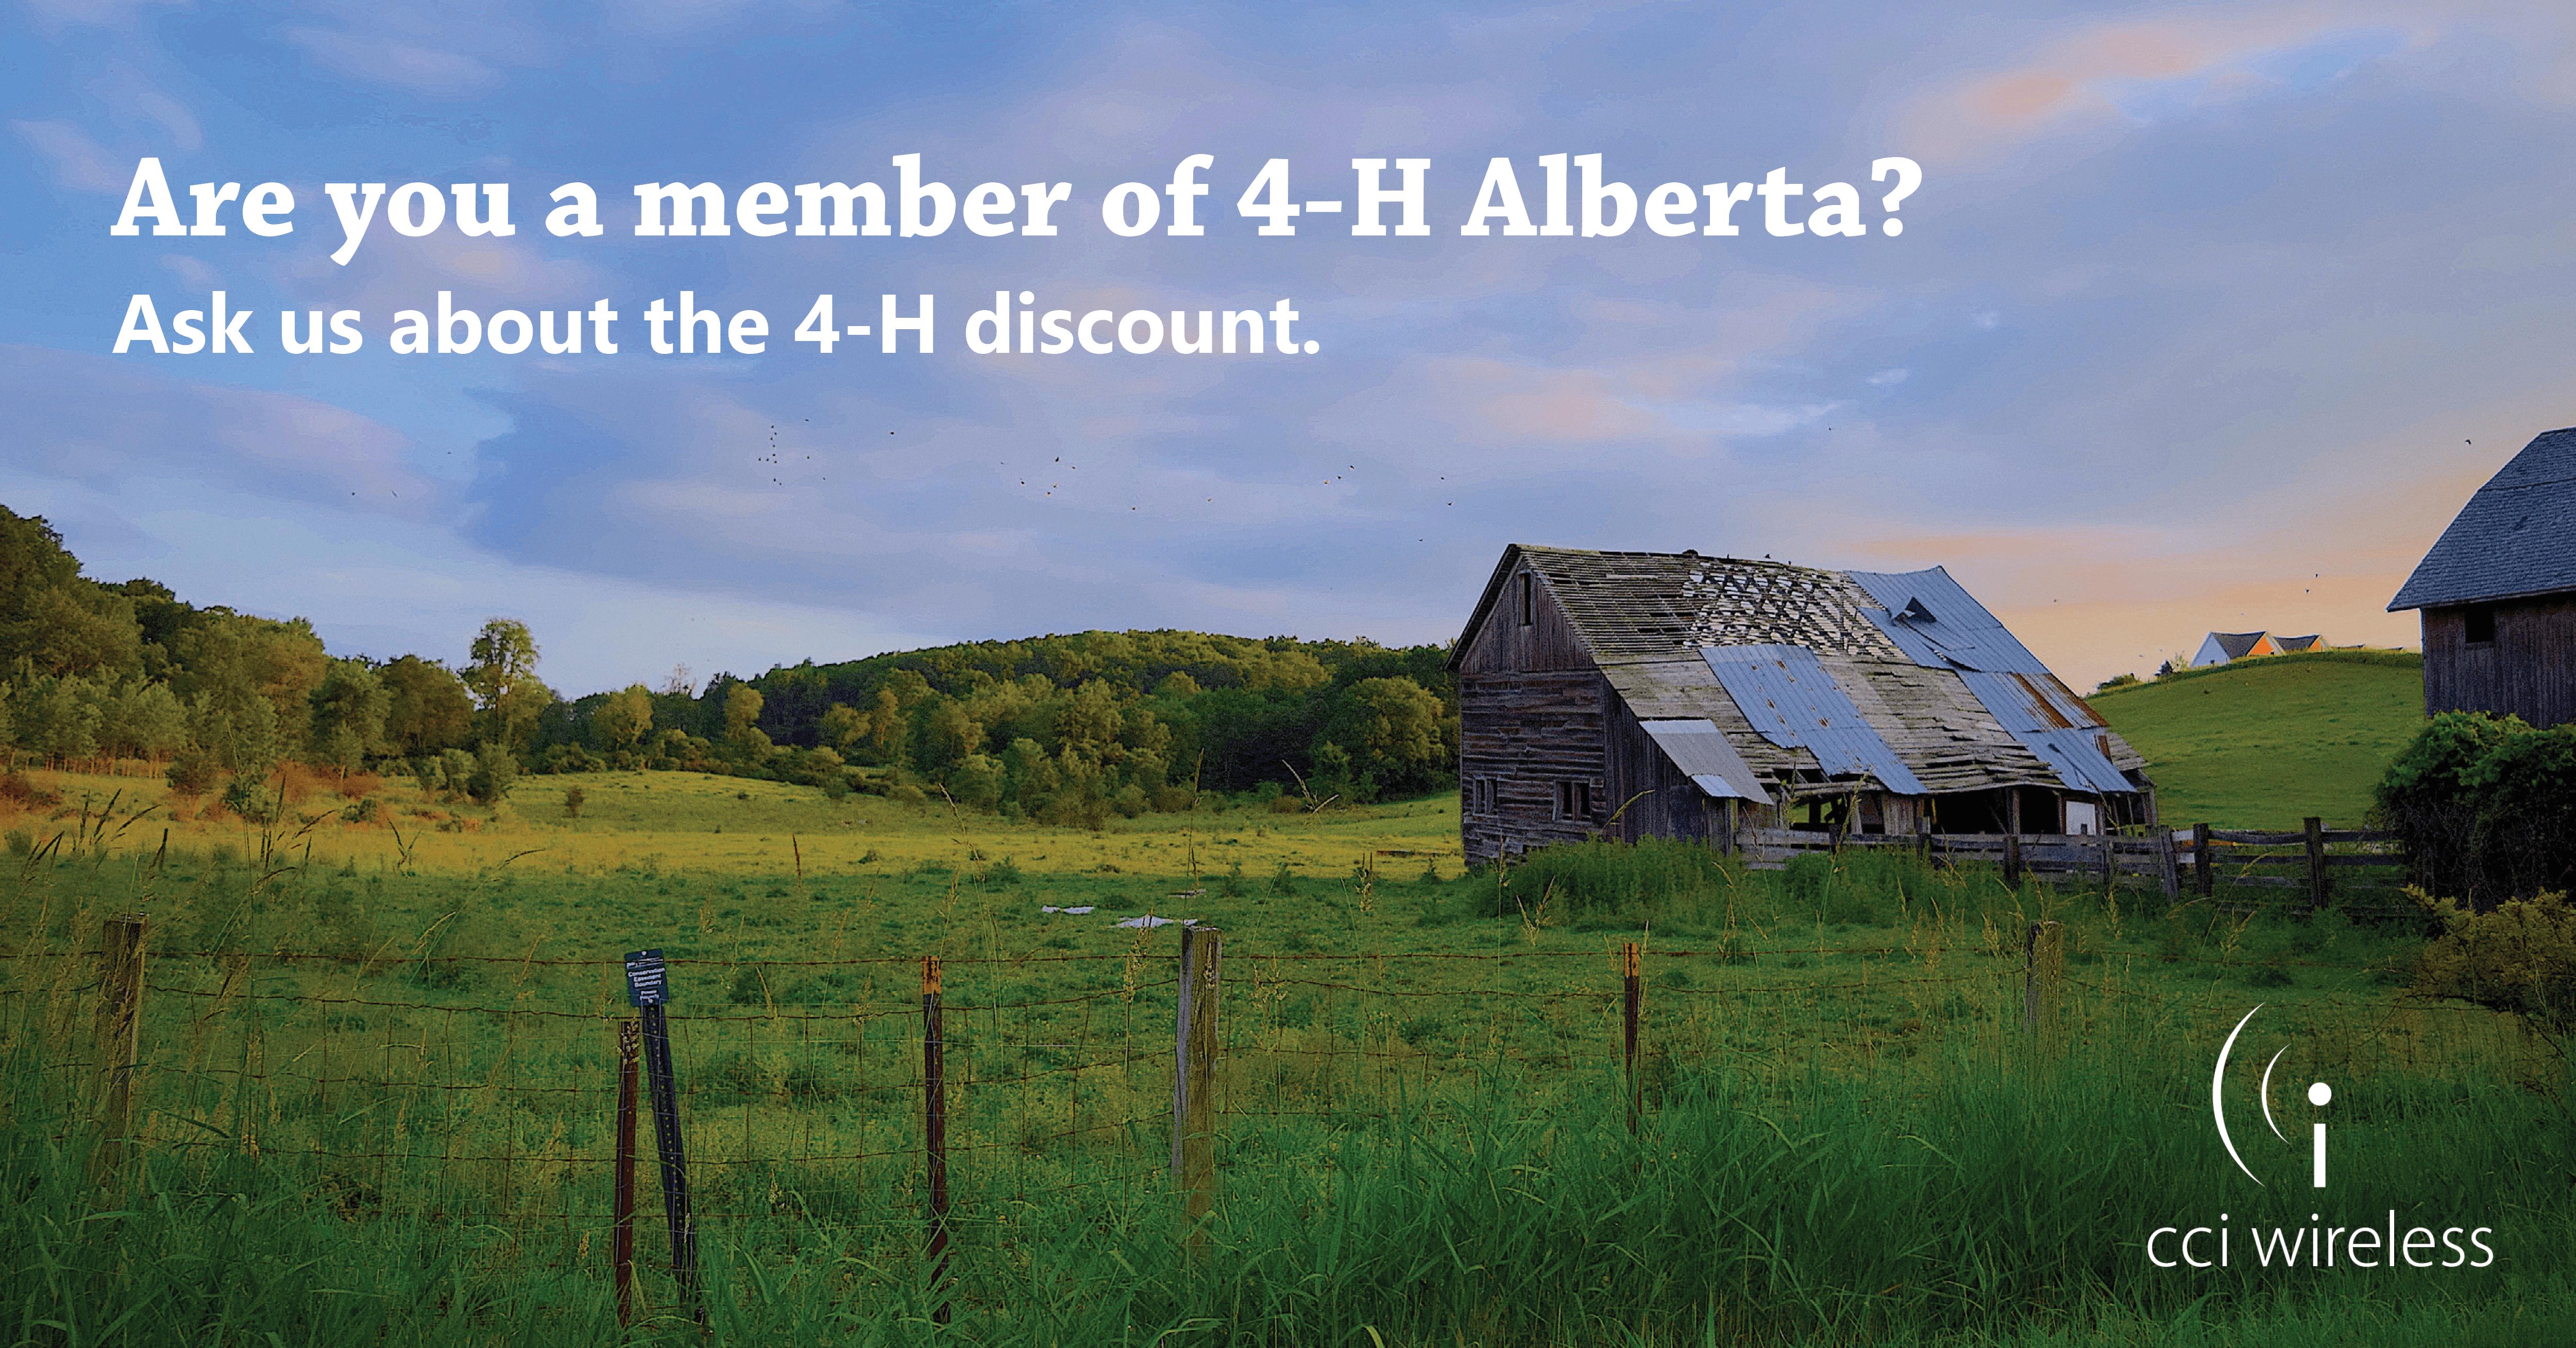 New 4-H Alberta Family Discount